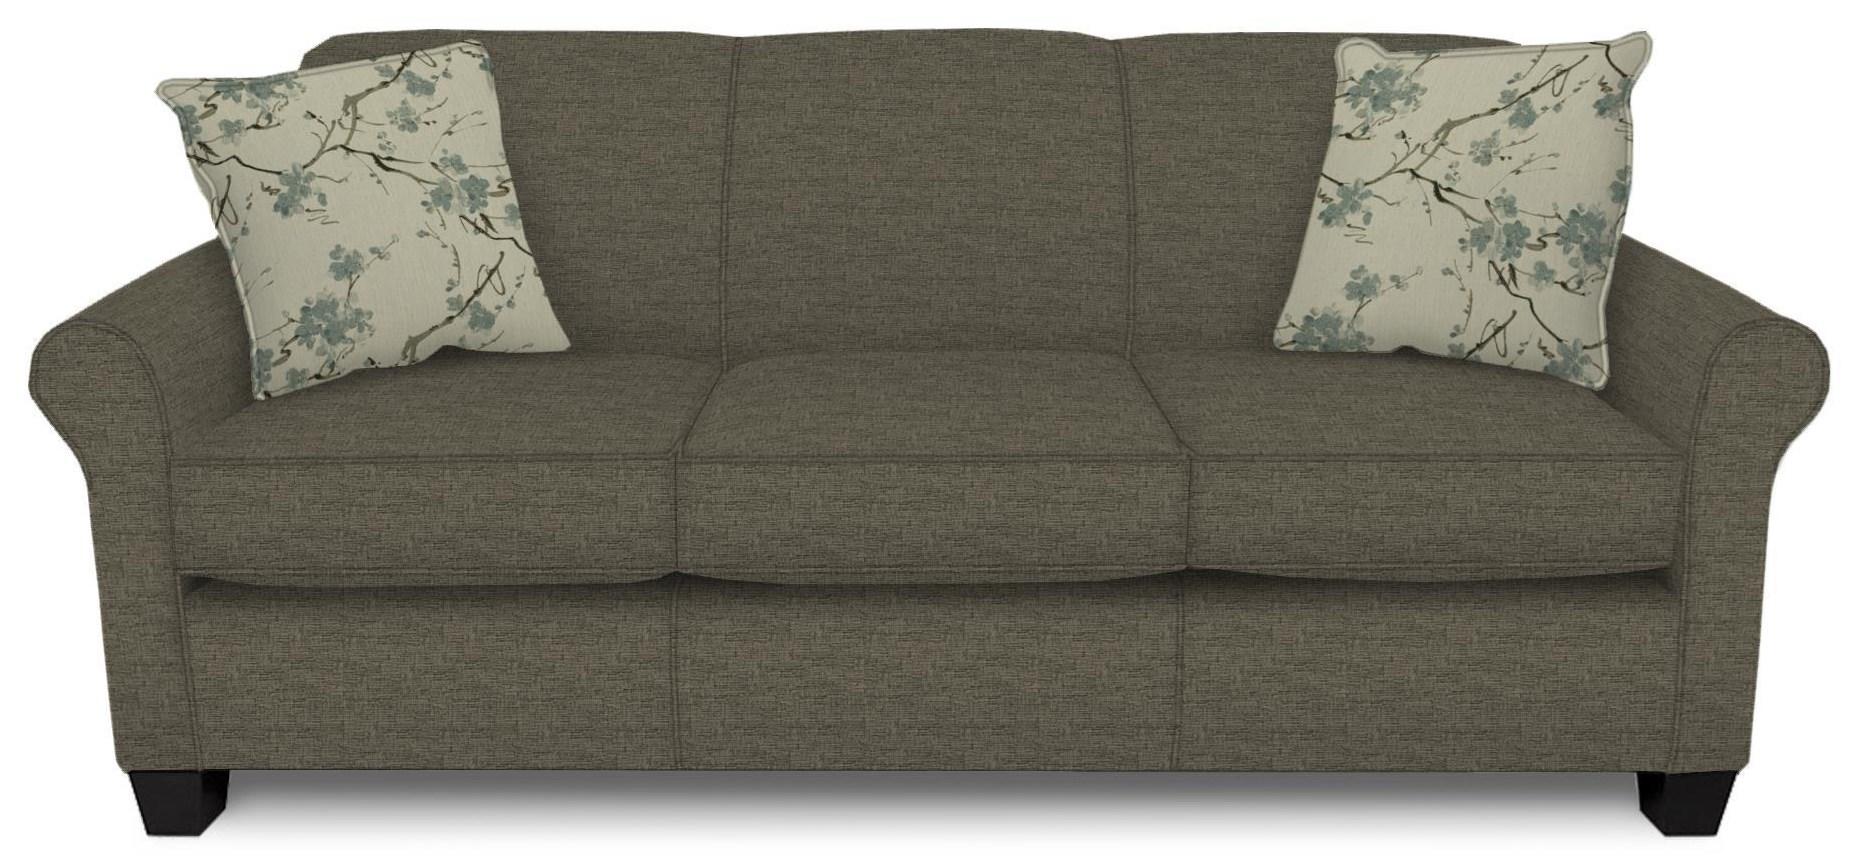 Damian Casual Stationary Sofa by England at Crowley Furniture & Mattress